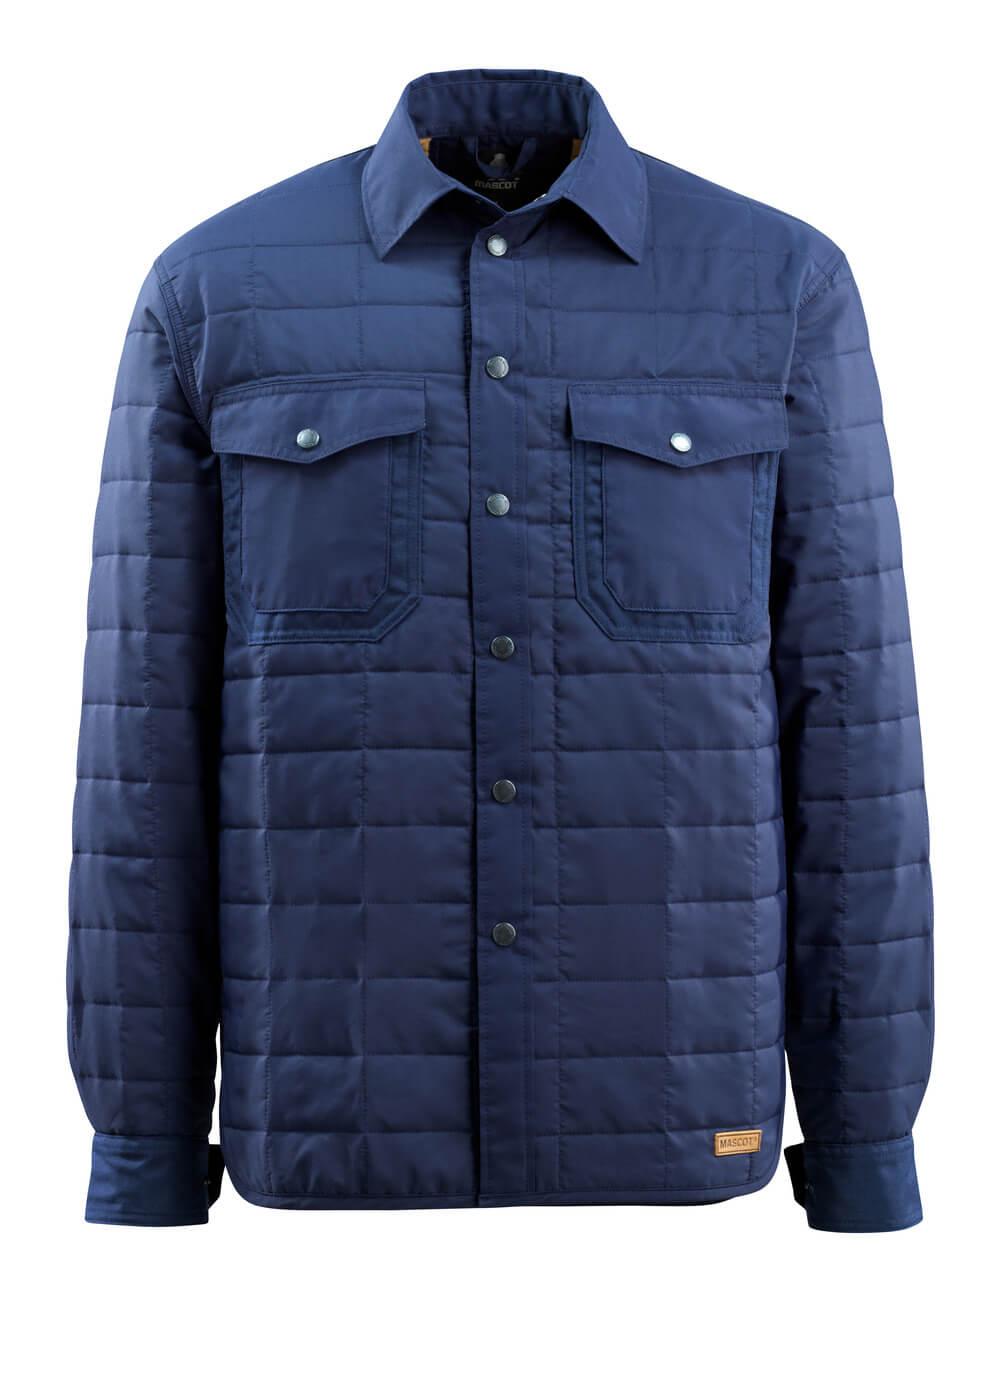 15304-097-01 Camicia con fodera - blu navy